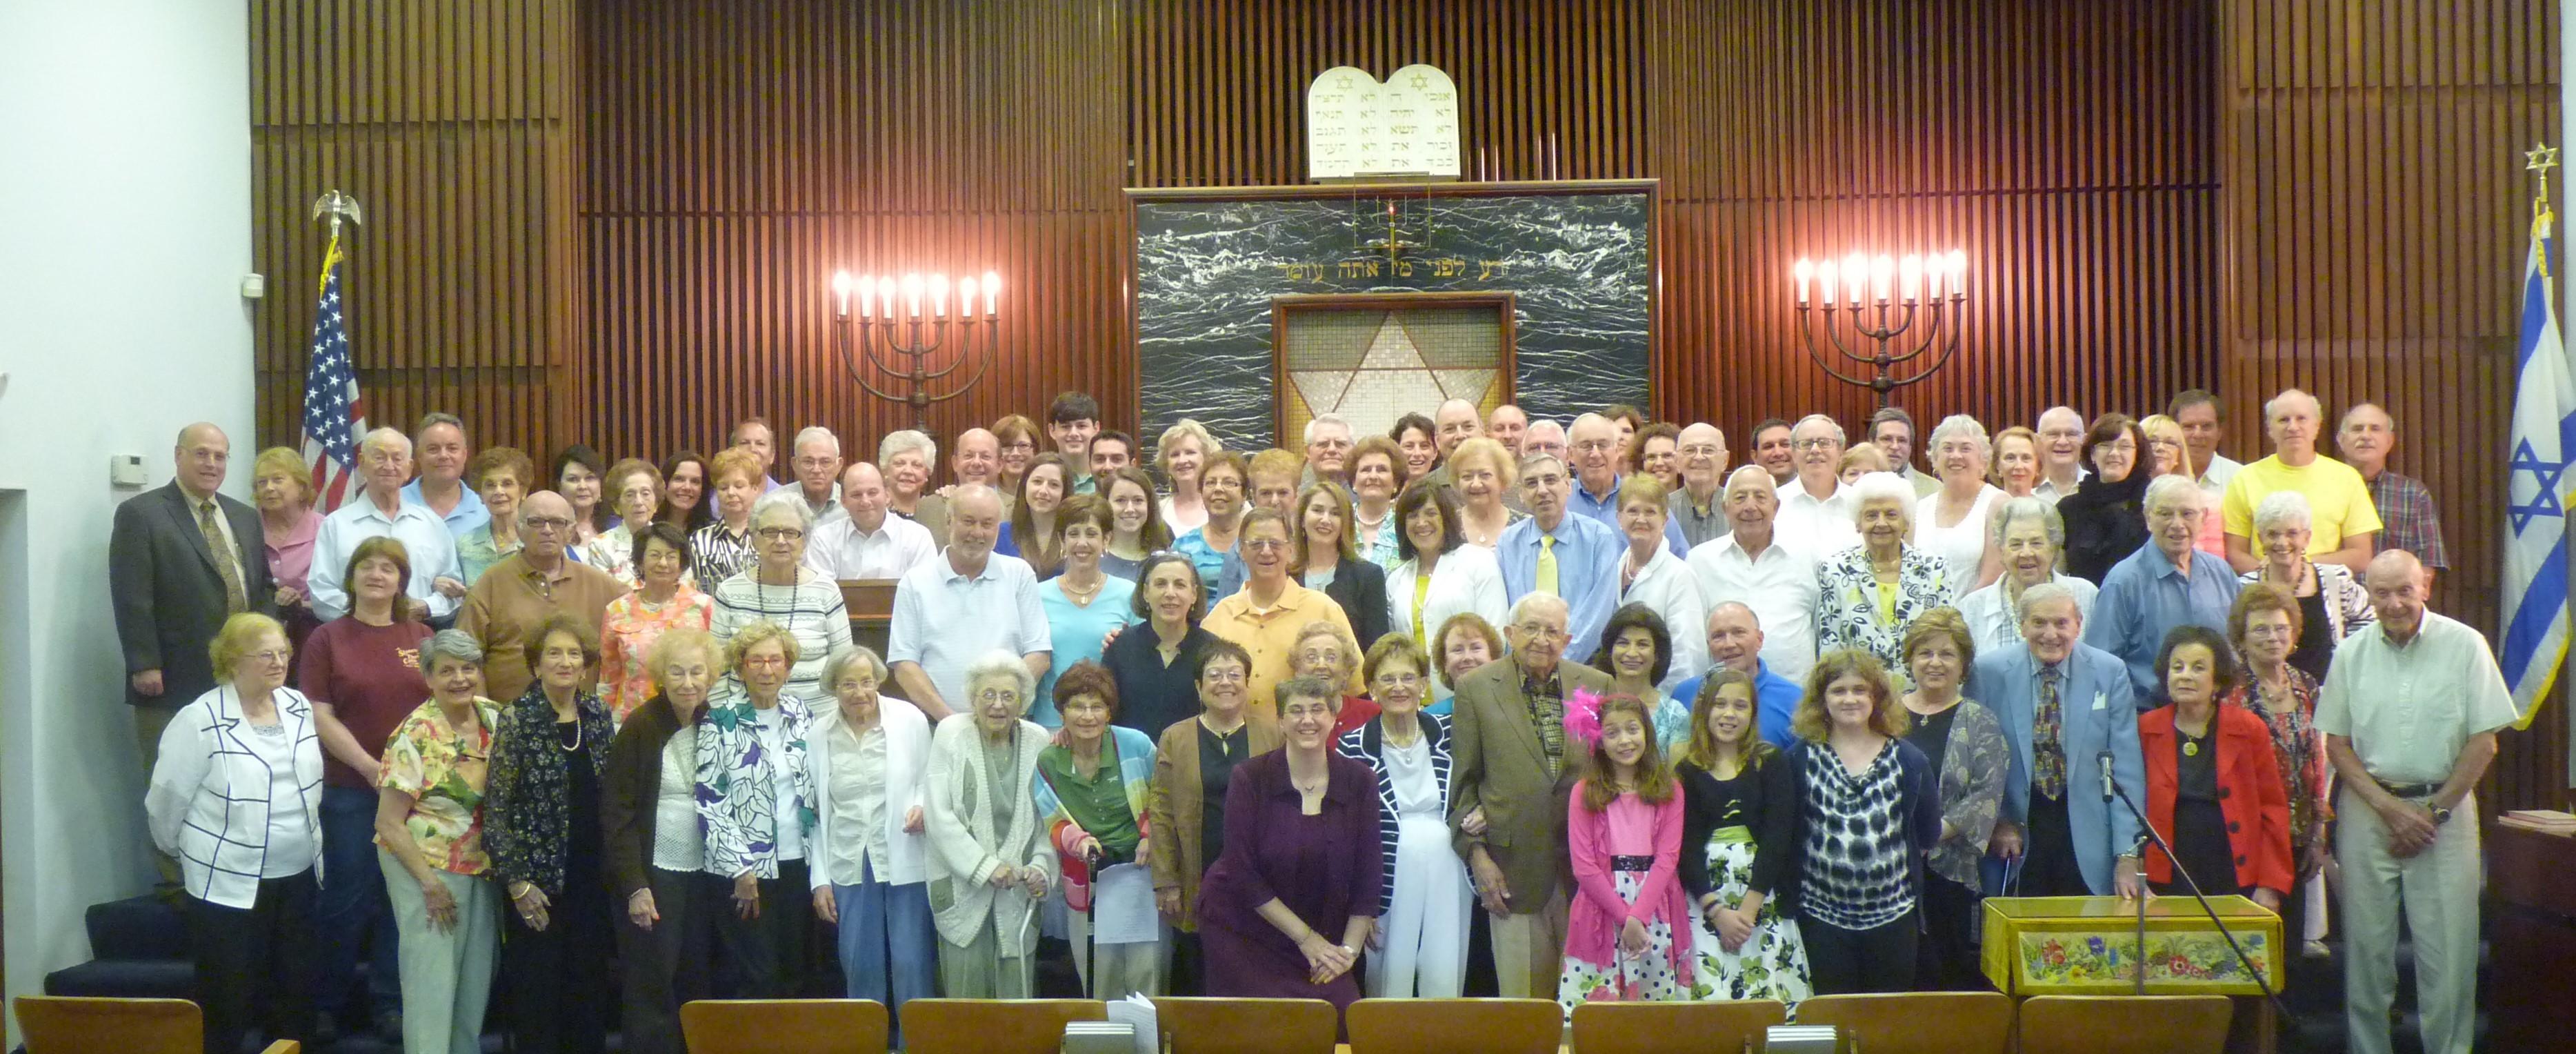 "<span class=""slider_title"">                                     2012 BZ Congregation                                </span>"